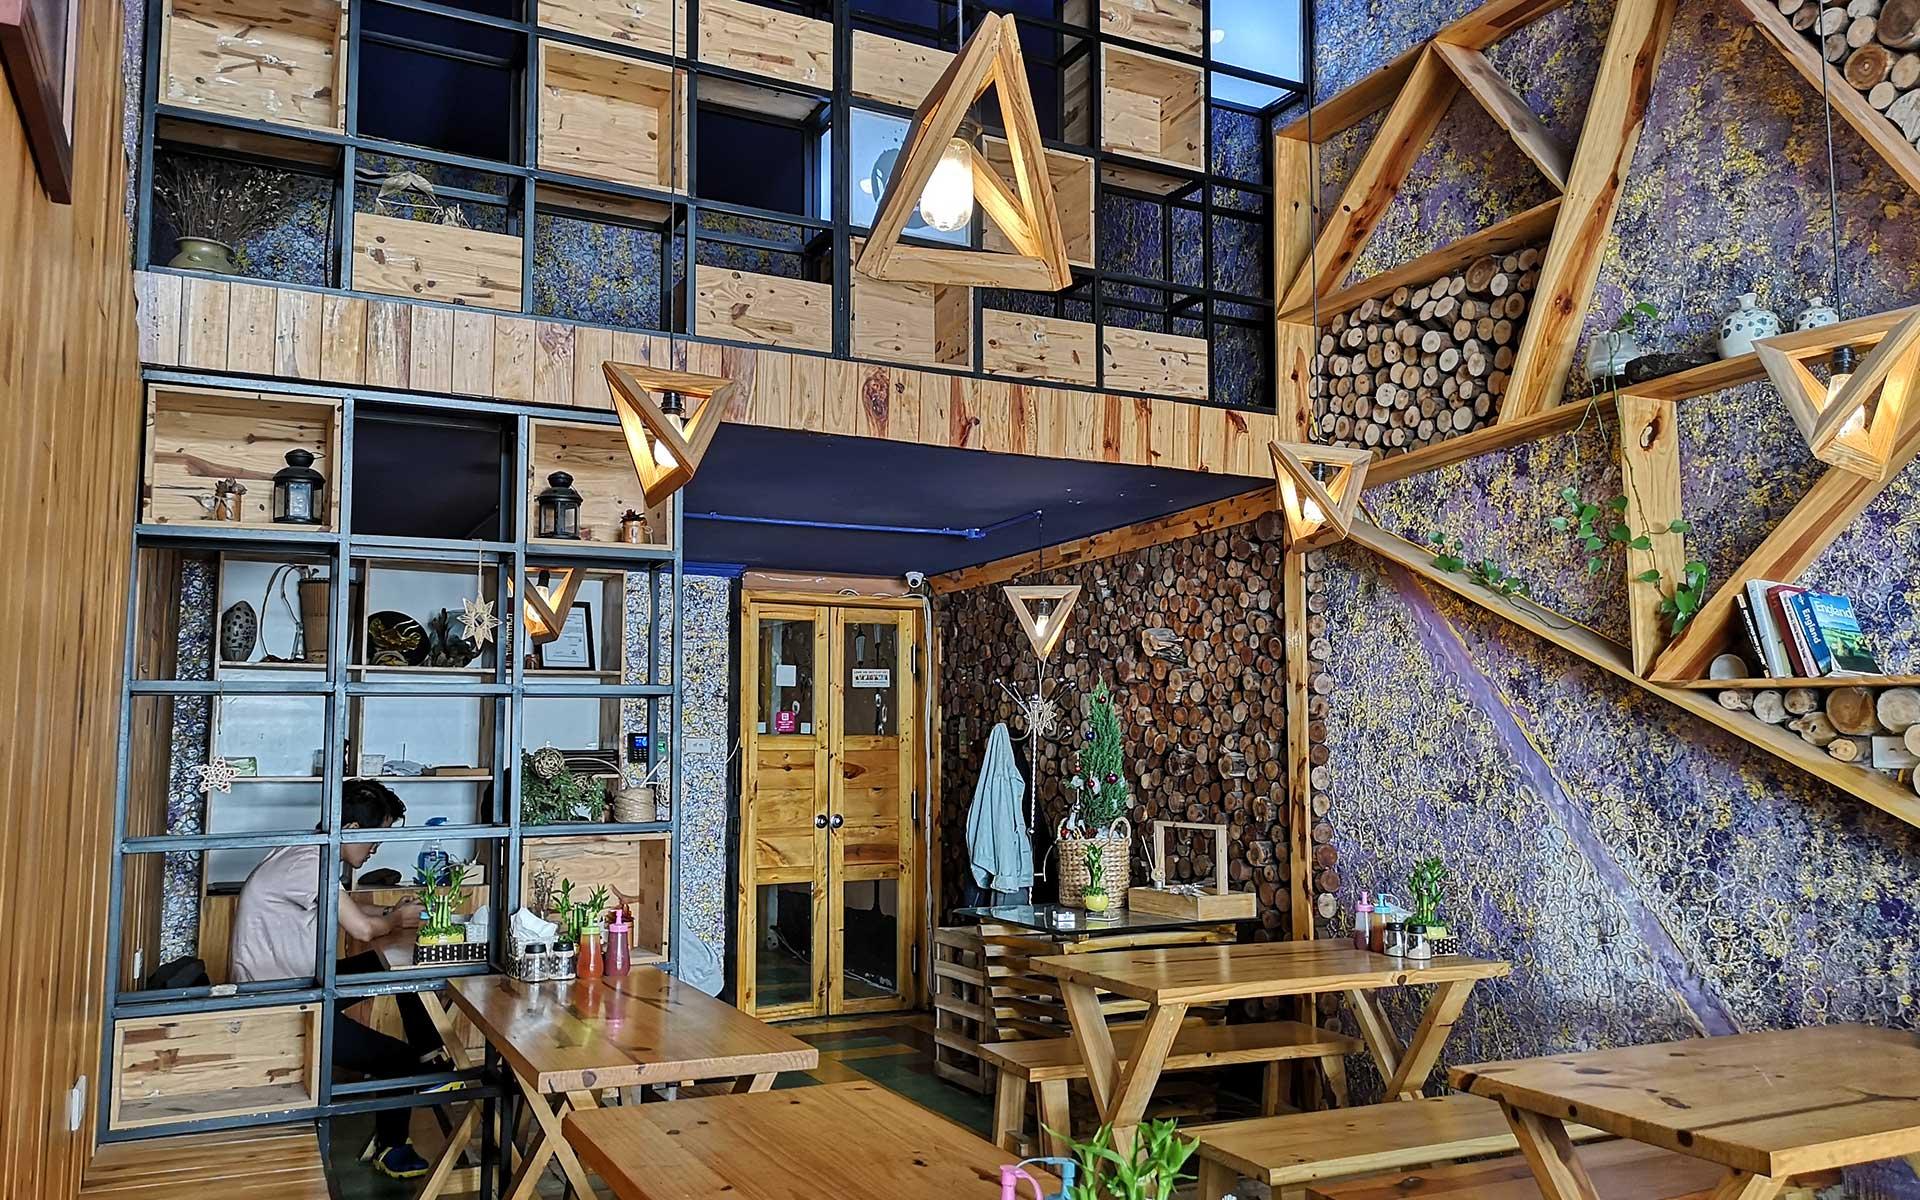 Popular spot for vegan lovers at Jagus Vegan Kitchen and Cafe